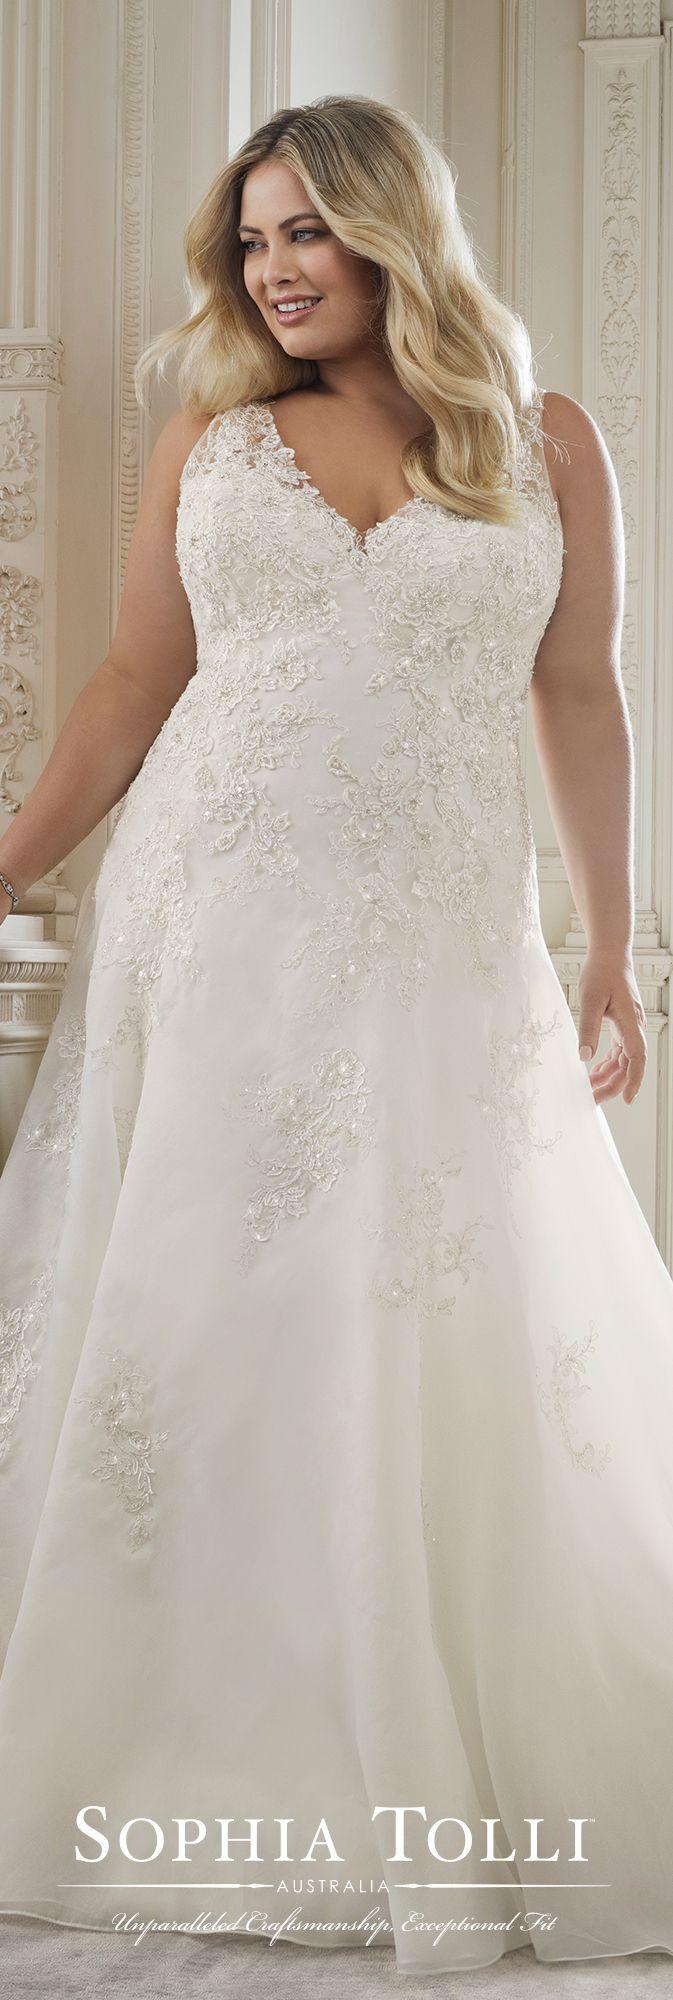 240 best Brautkleider plus size images on Pinterest | Bridal gowns ...